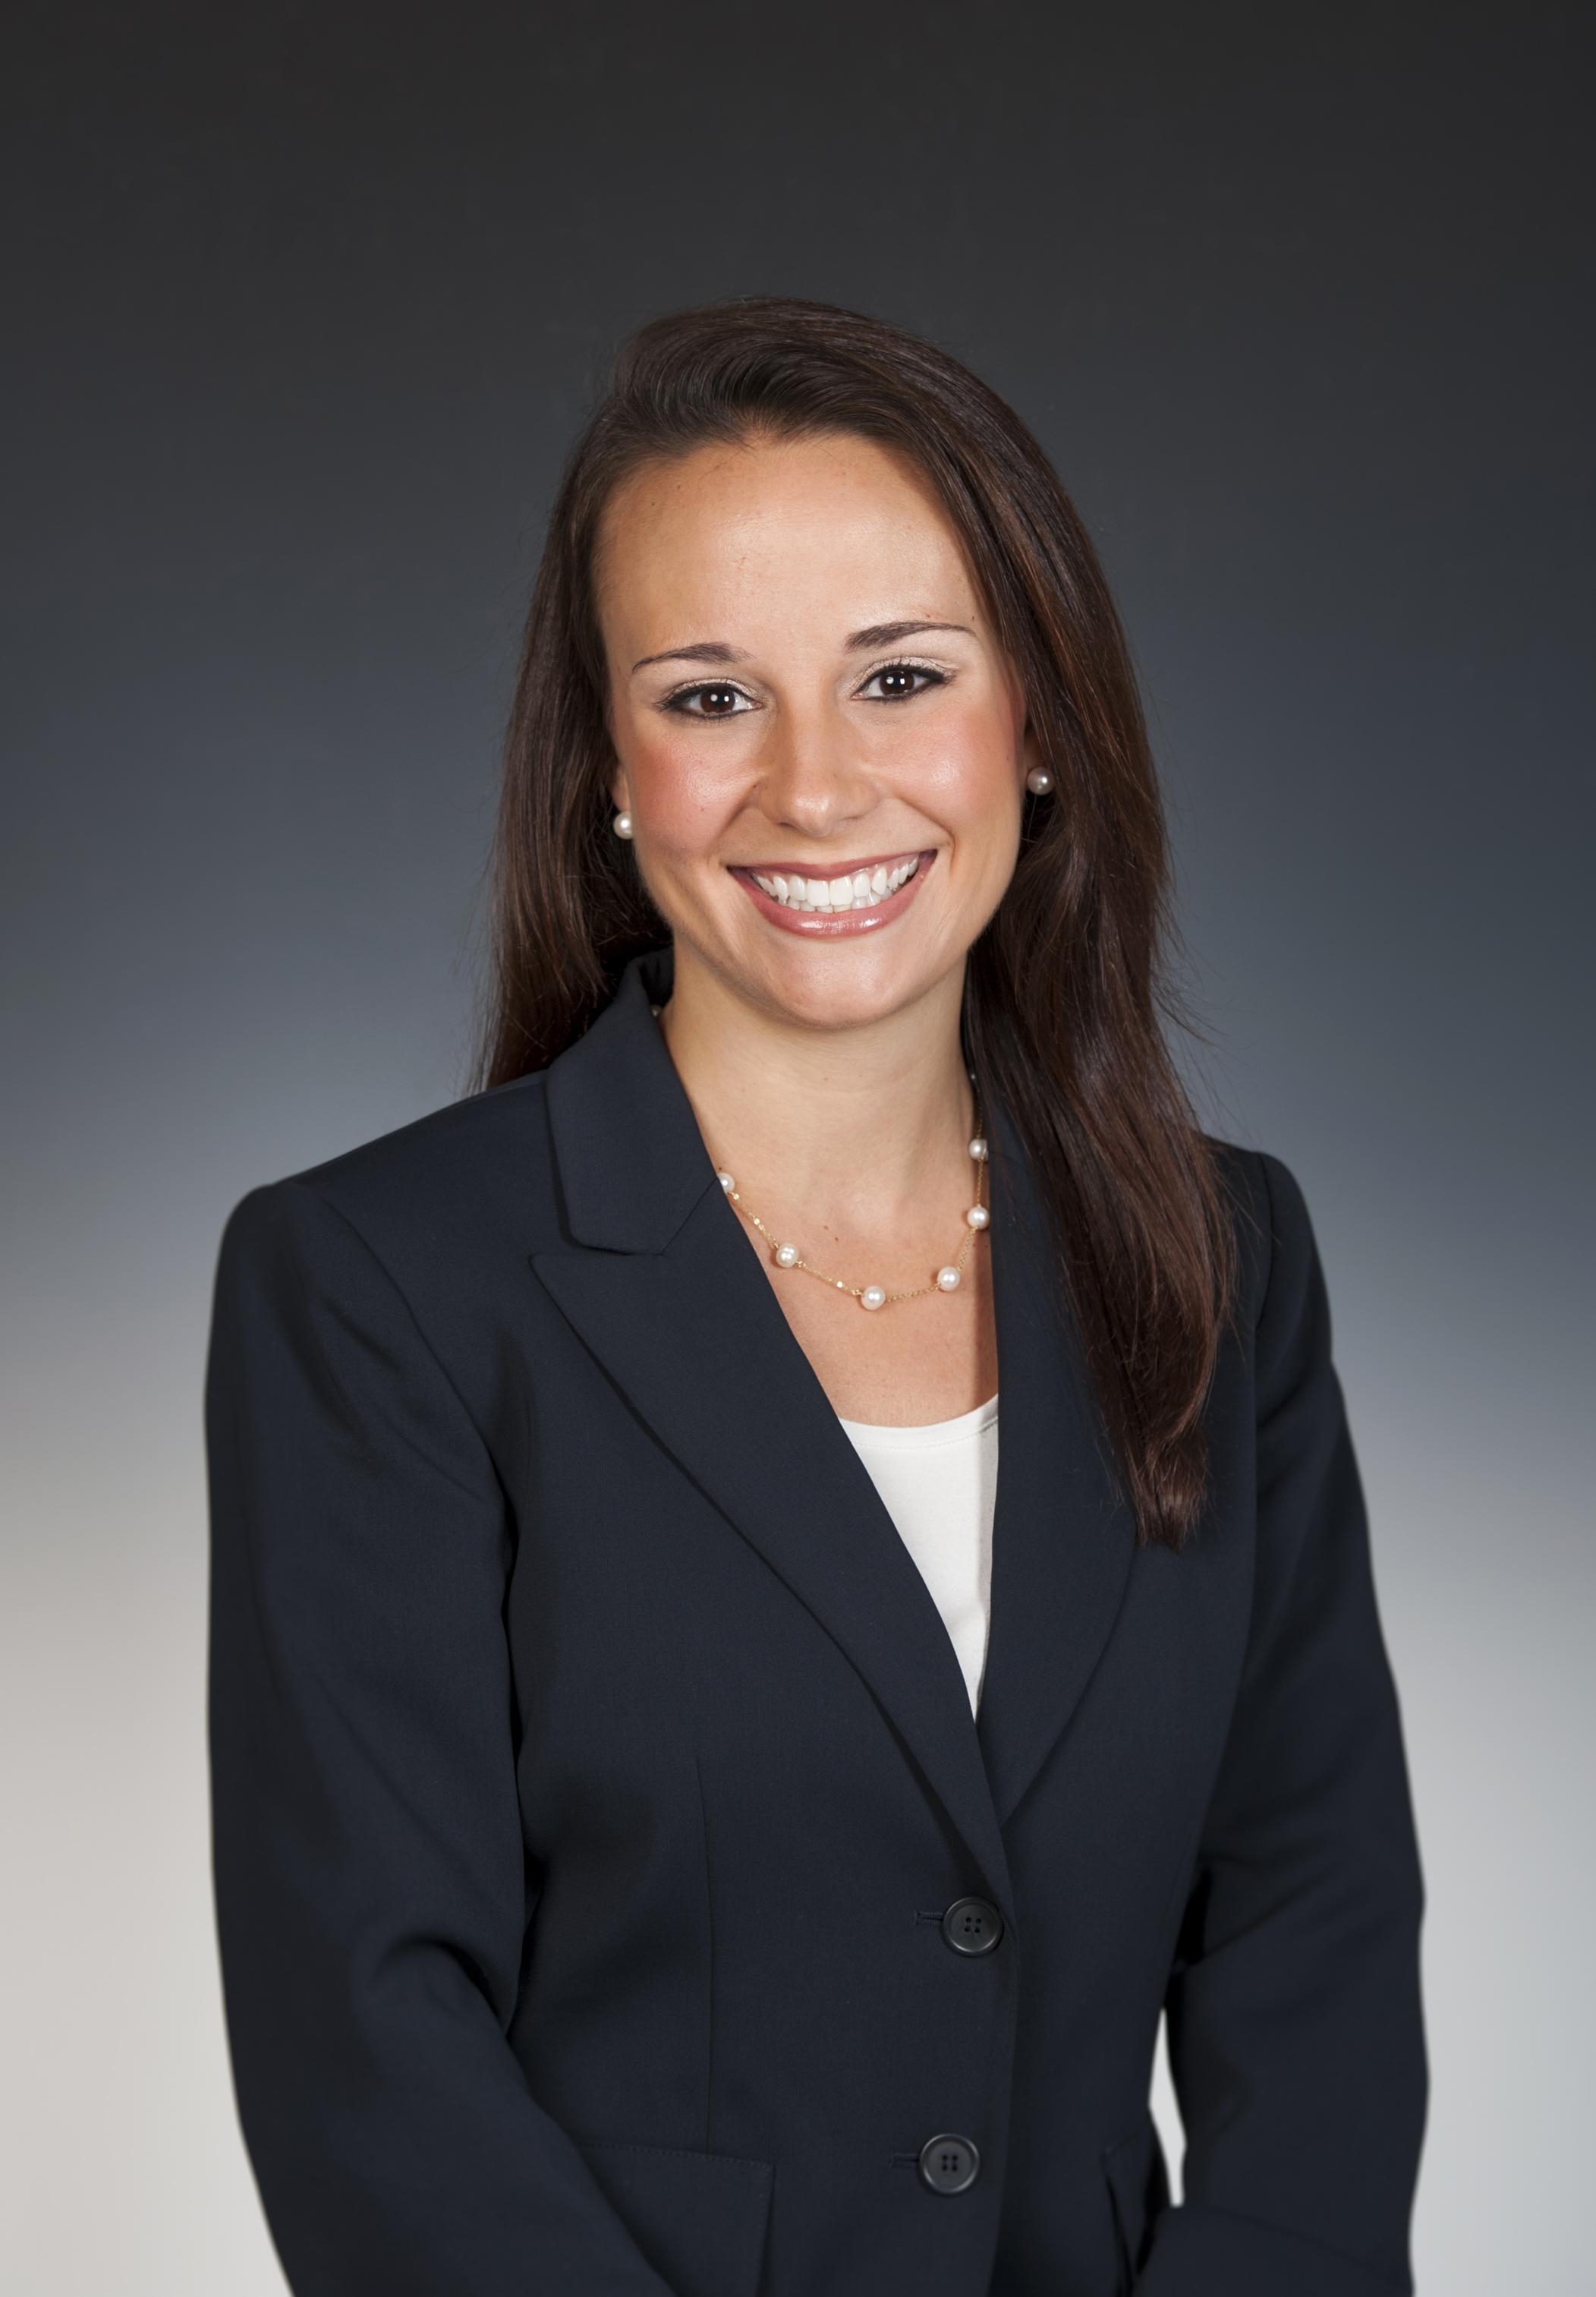 Stephanie Mitrione